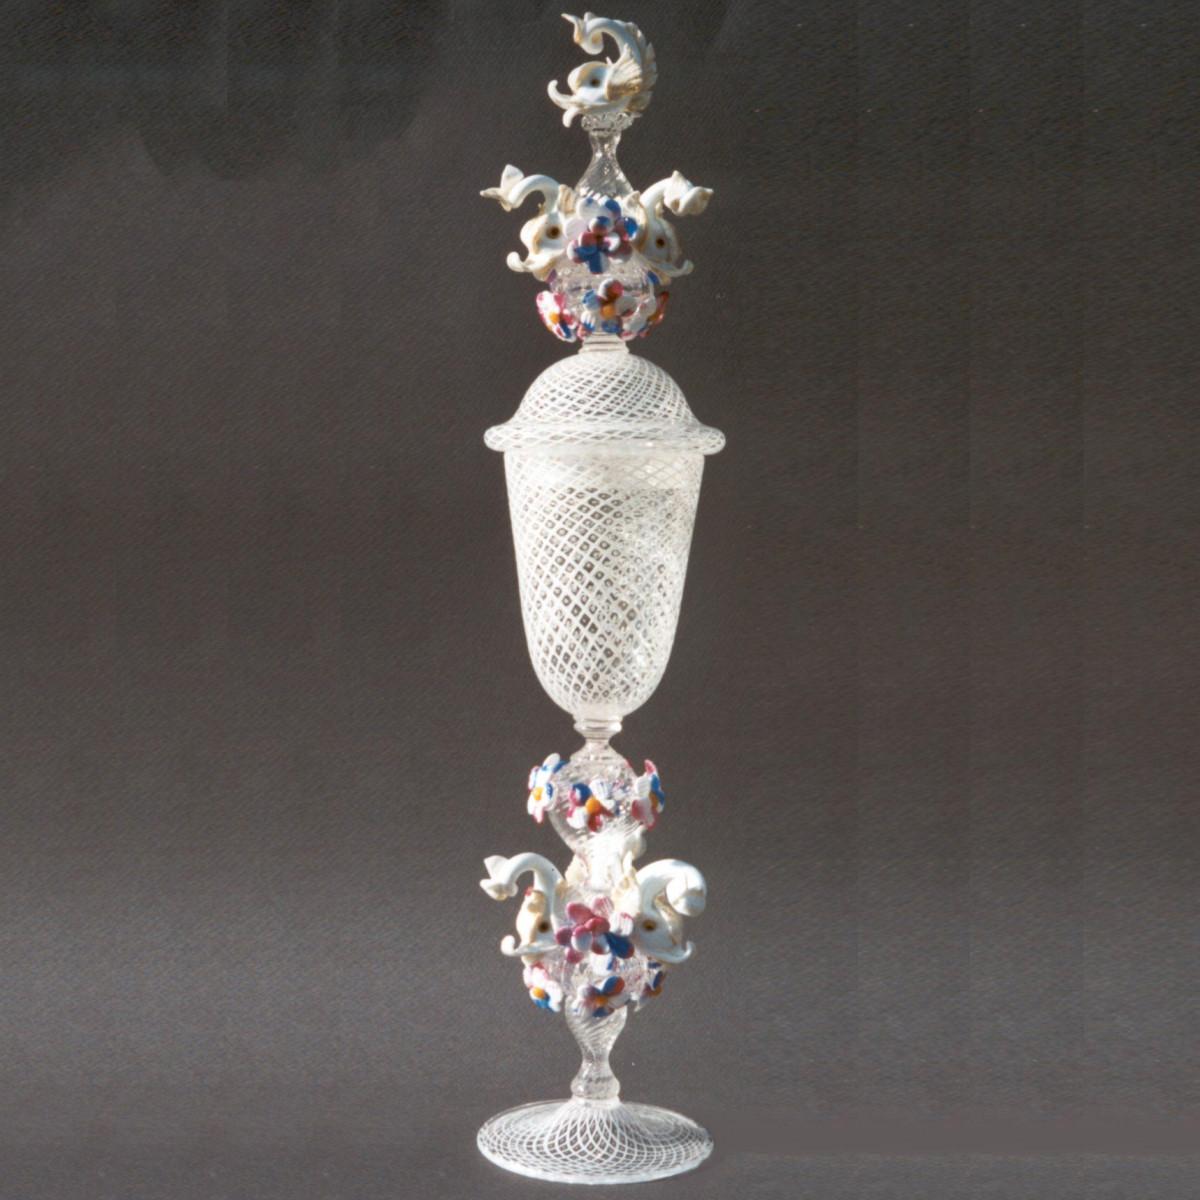 """Delfini"" Murano drinking glass - white"